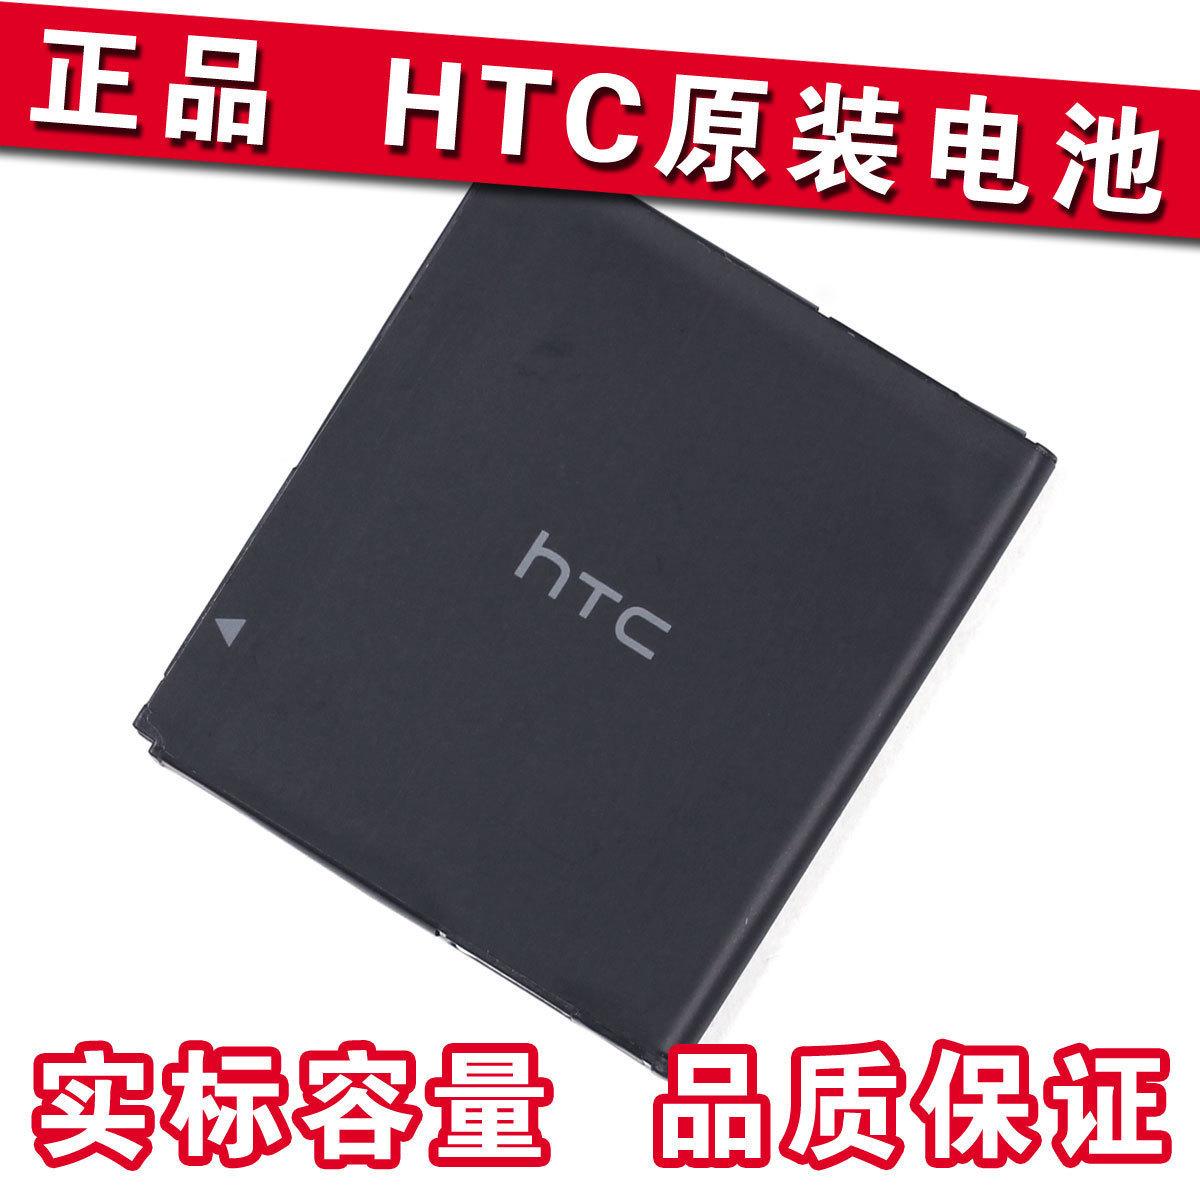 htc g10